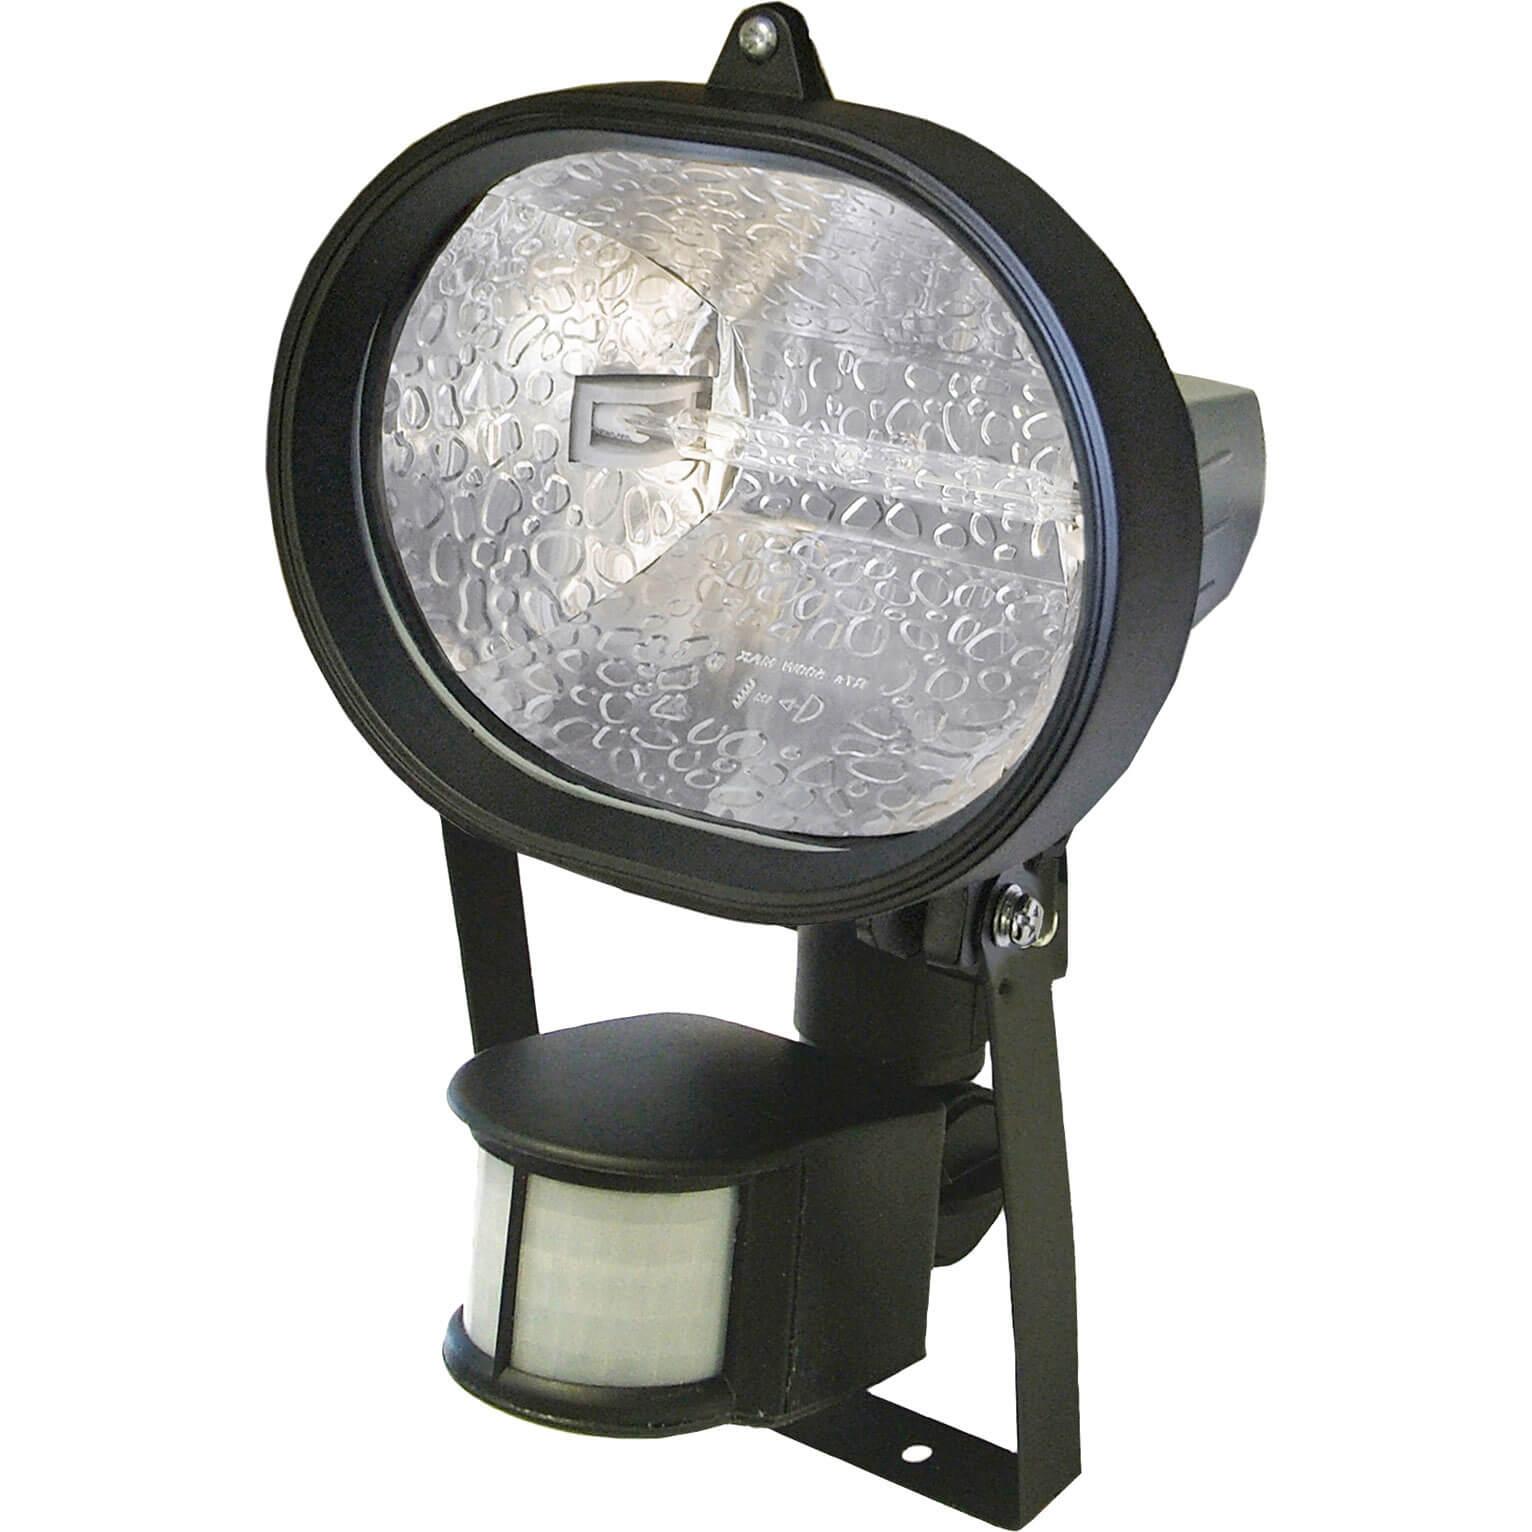 Image of Faithfull 150w Portable PIR Security Light 240v